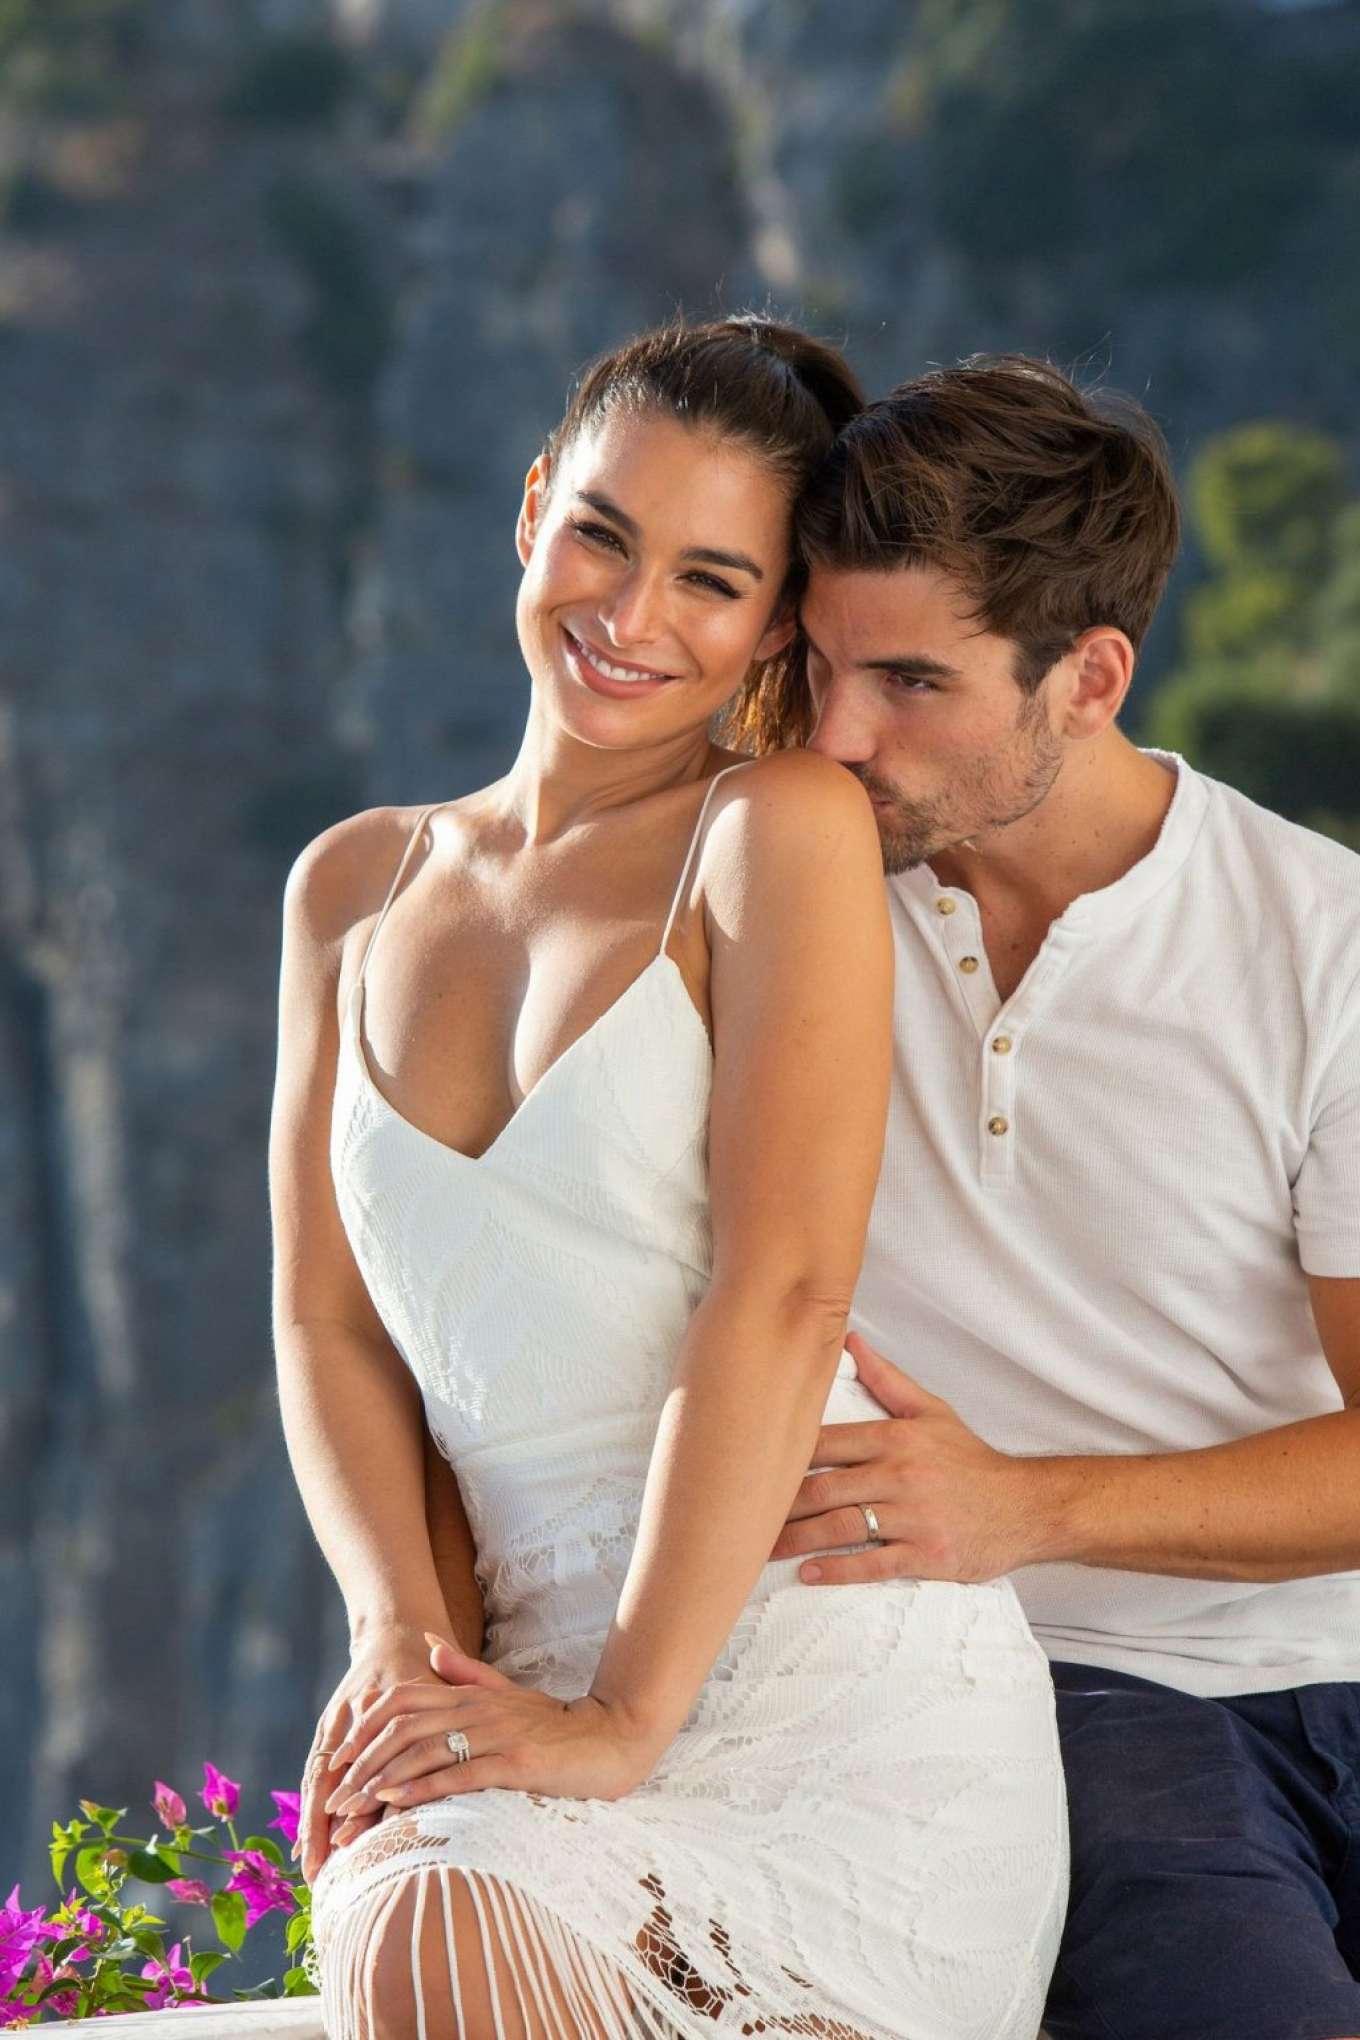 Ashley Iaconetti 2019 : Ashley Iaconetti and Jared Haibon on their honeymoon-04